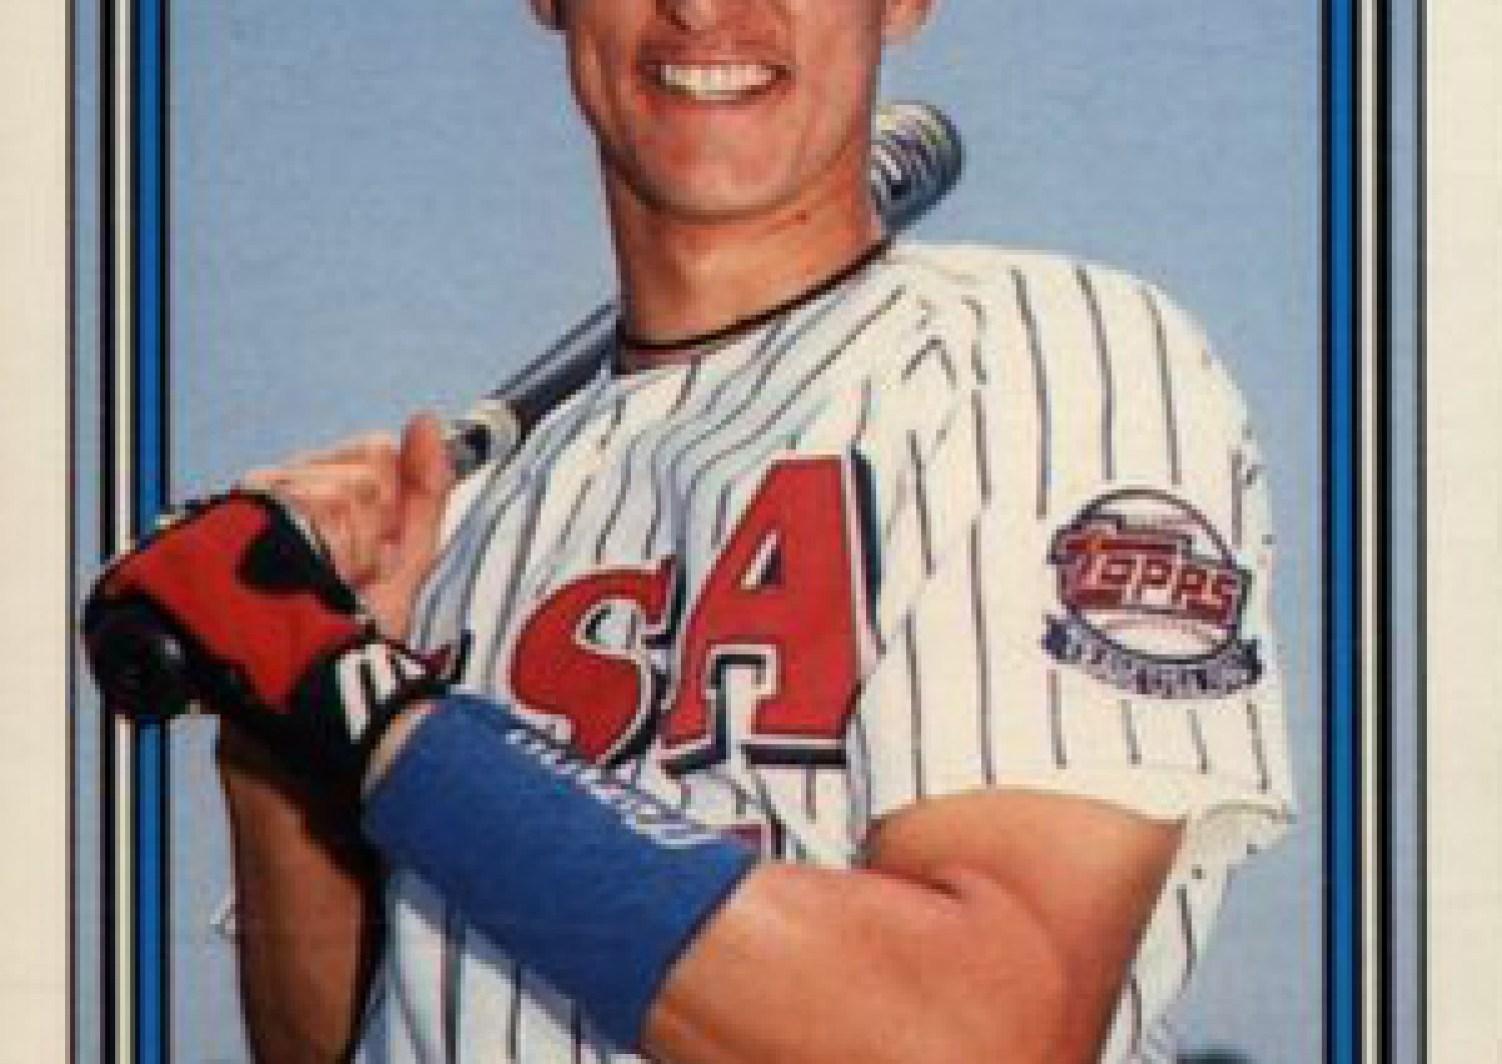 1992 Topps Traded Baseball Checklist Set Info Key Cards Sets More